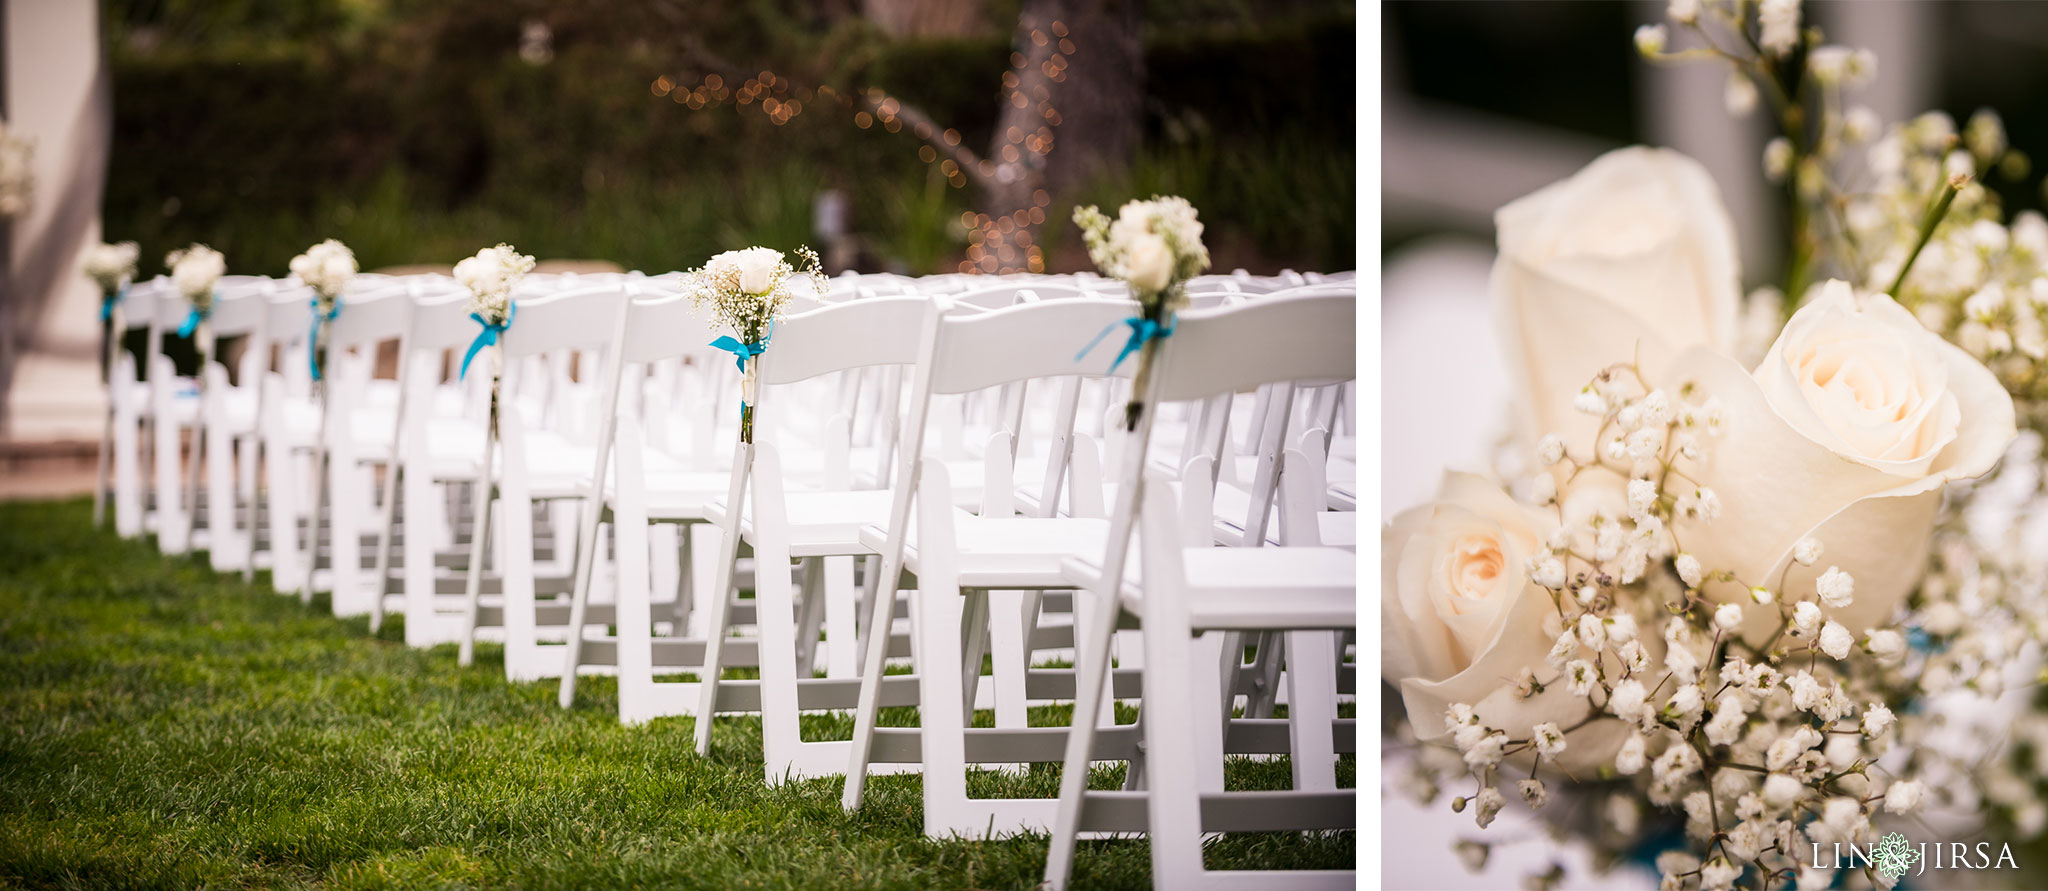 18 turnip rose promenade orange county wedding ceremony photography